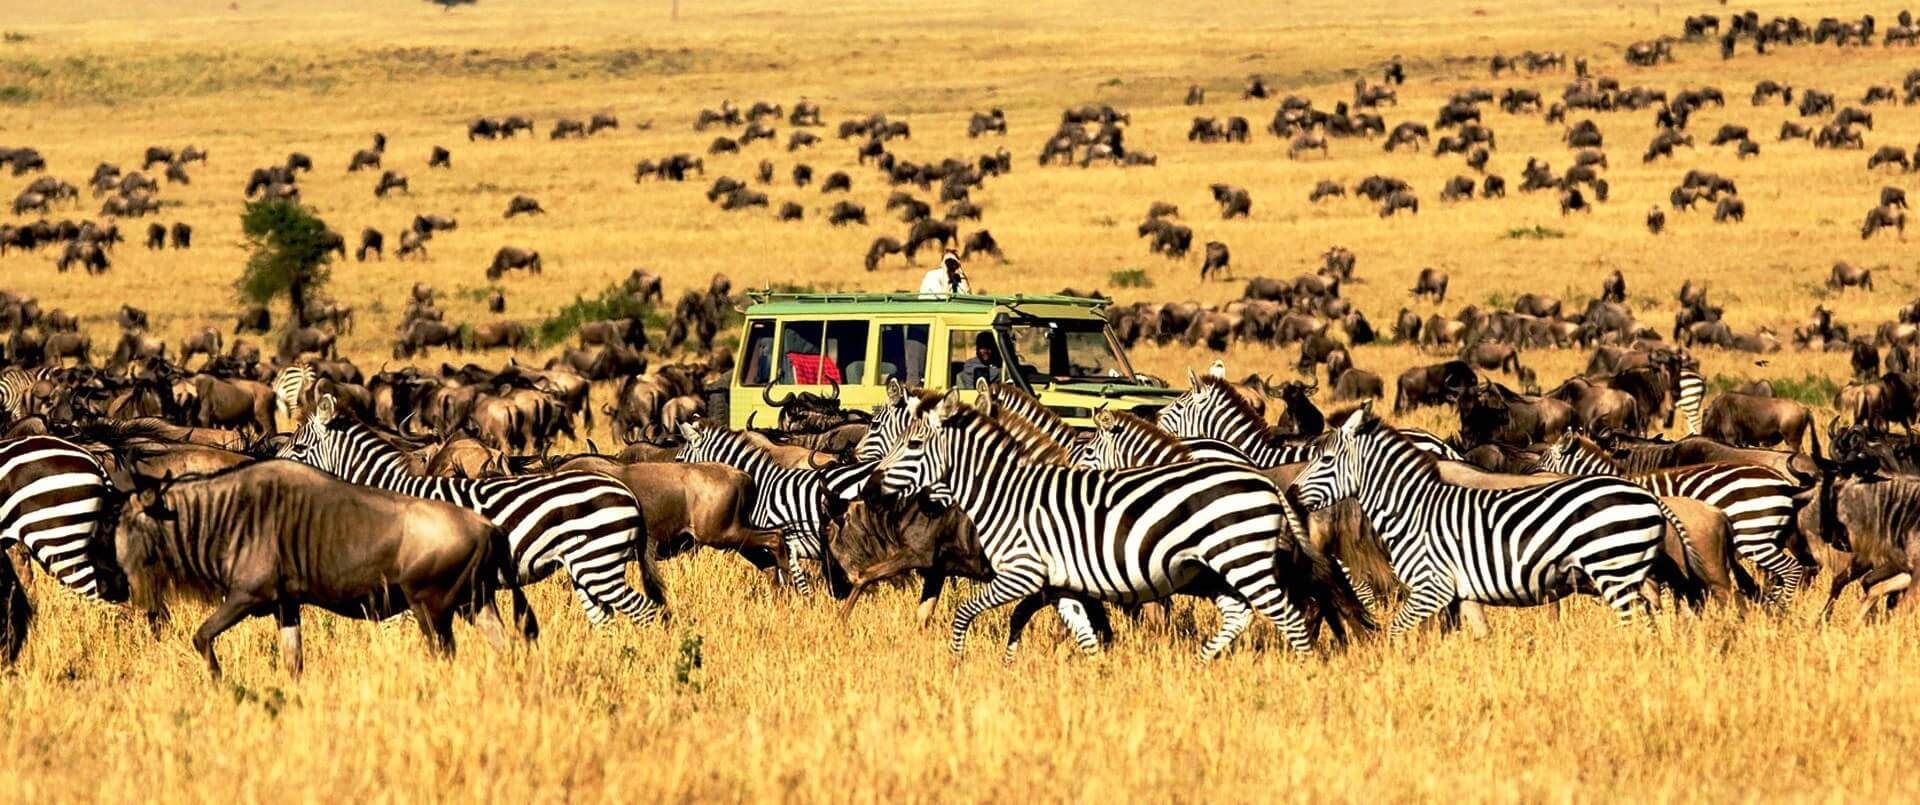 Zebras and wildebeest at Serengeti National Park